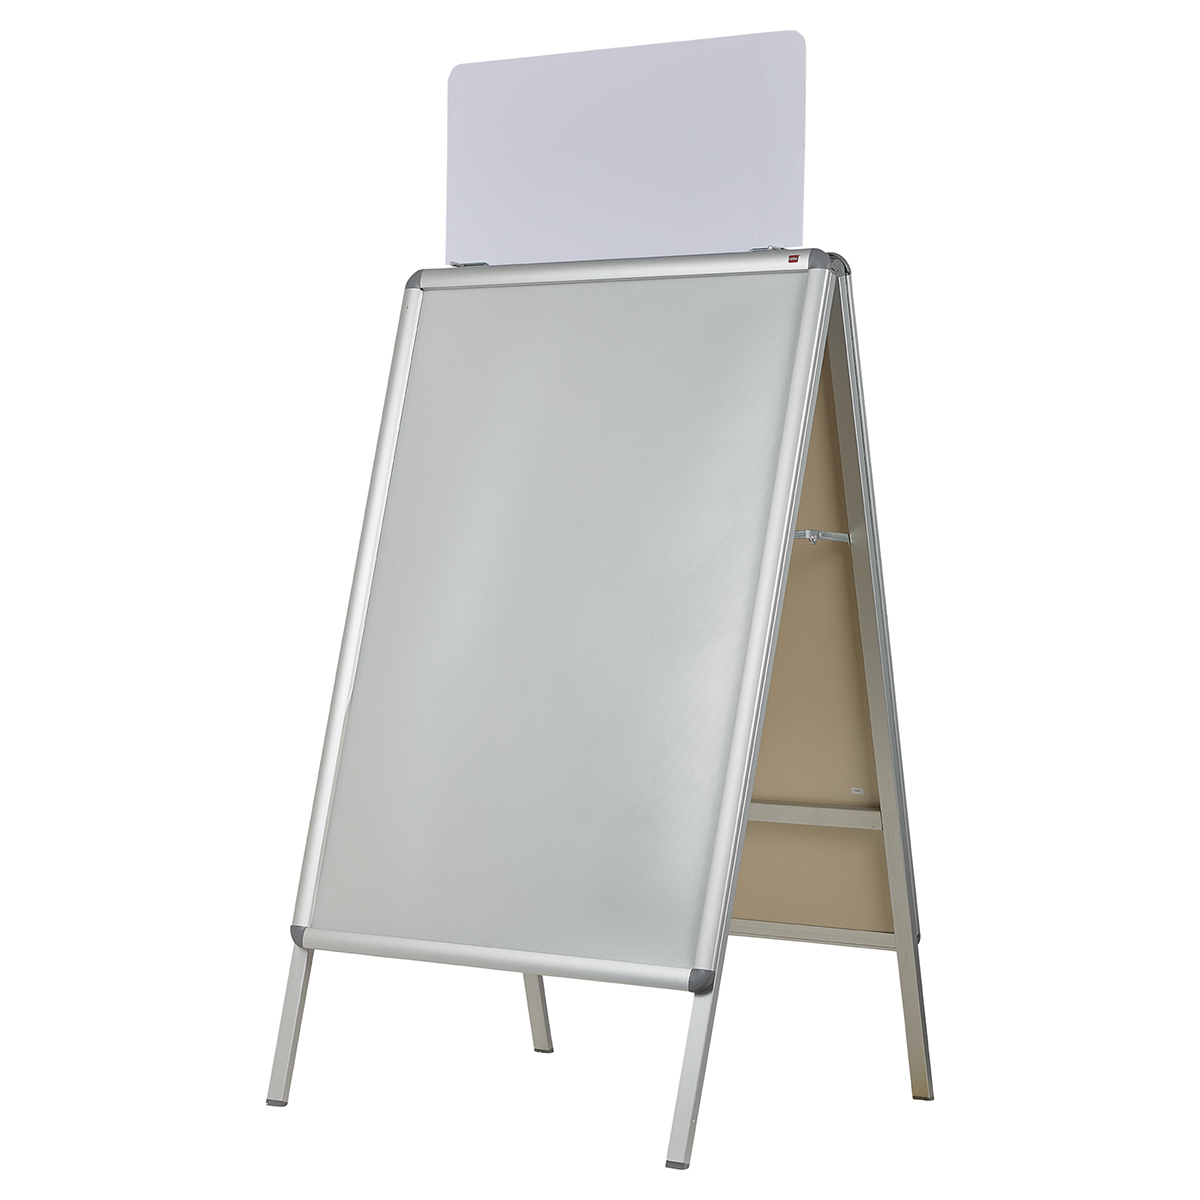 Nobo 1902377 A1 A-Board Clip Frame Header Panel Only